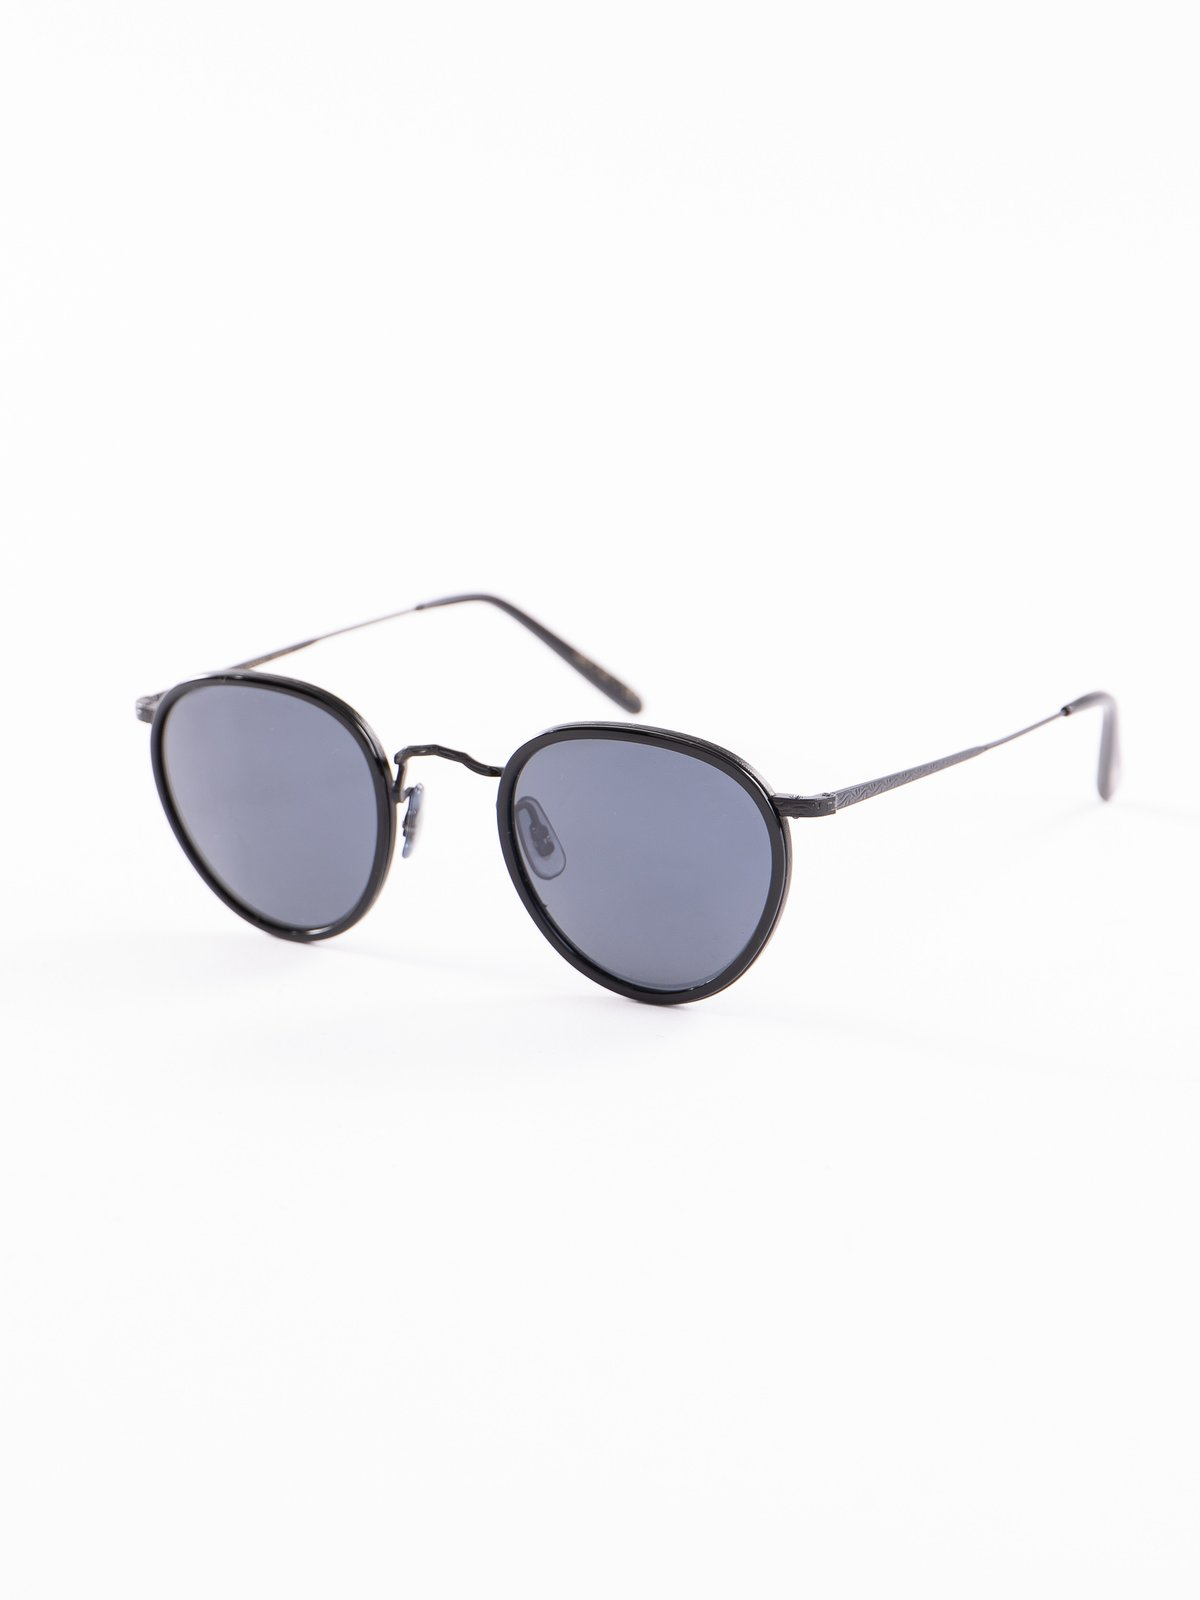 Black–Matte Black/Blue MP–2 Sunglasses - Image 2